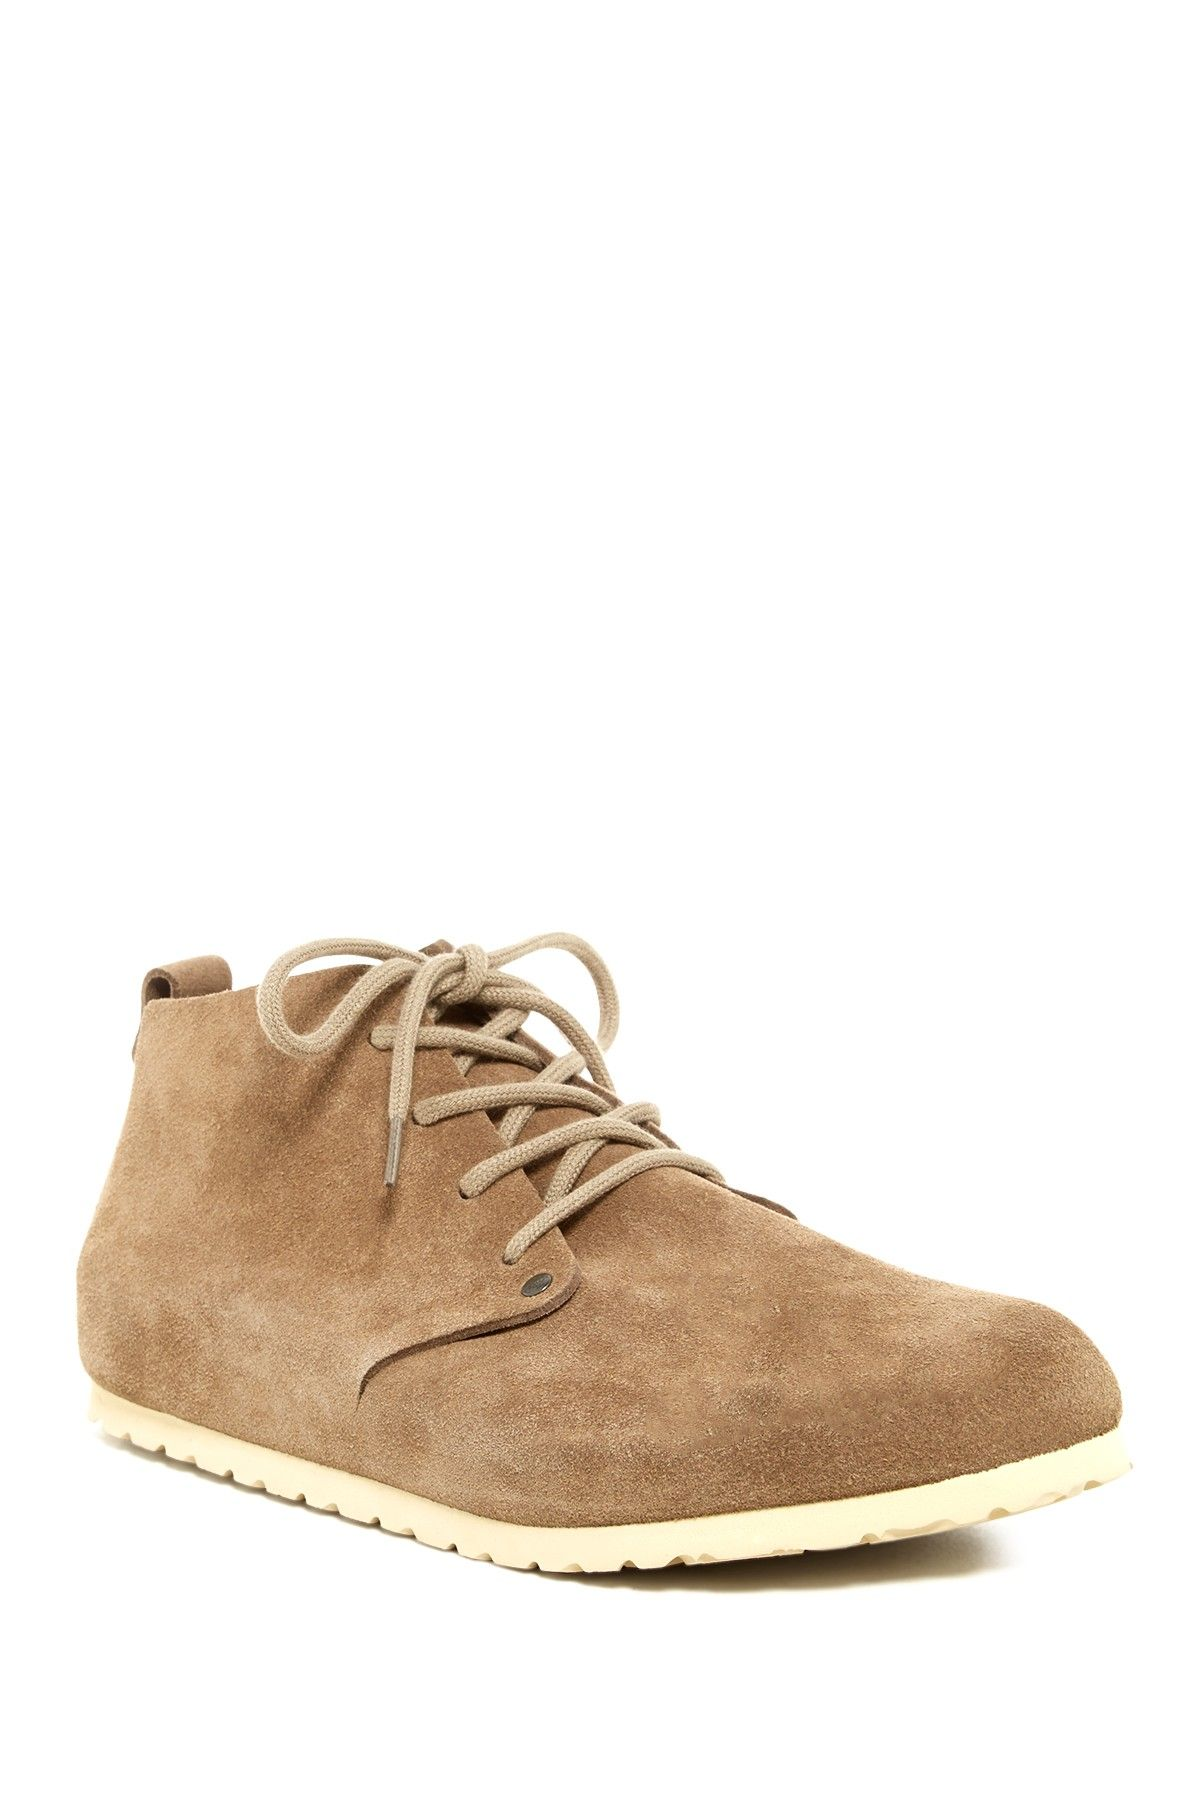 e5a7db18e828 Birkenstock Harrison Leather Lace Up Shoes